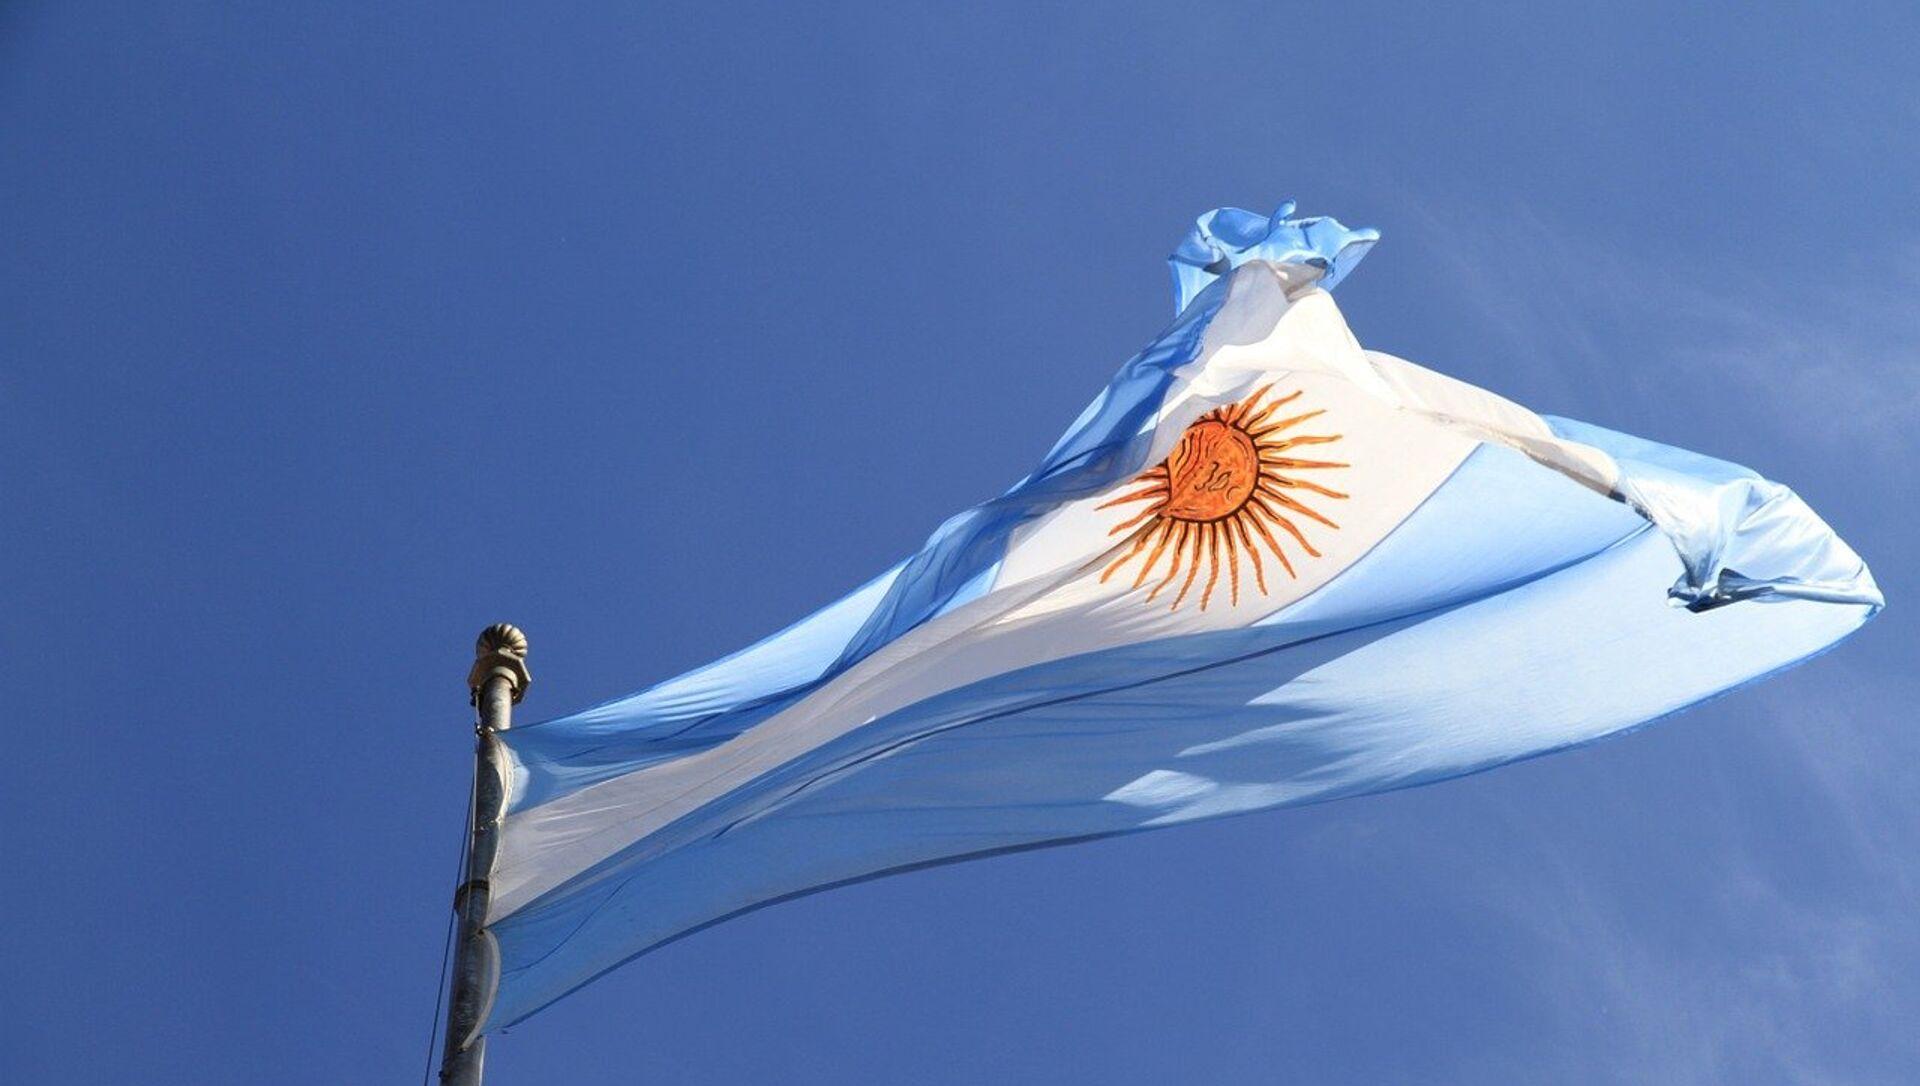 Bandera de Argentina - Sputnik Mundo, 1920, 19.06.2020